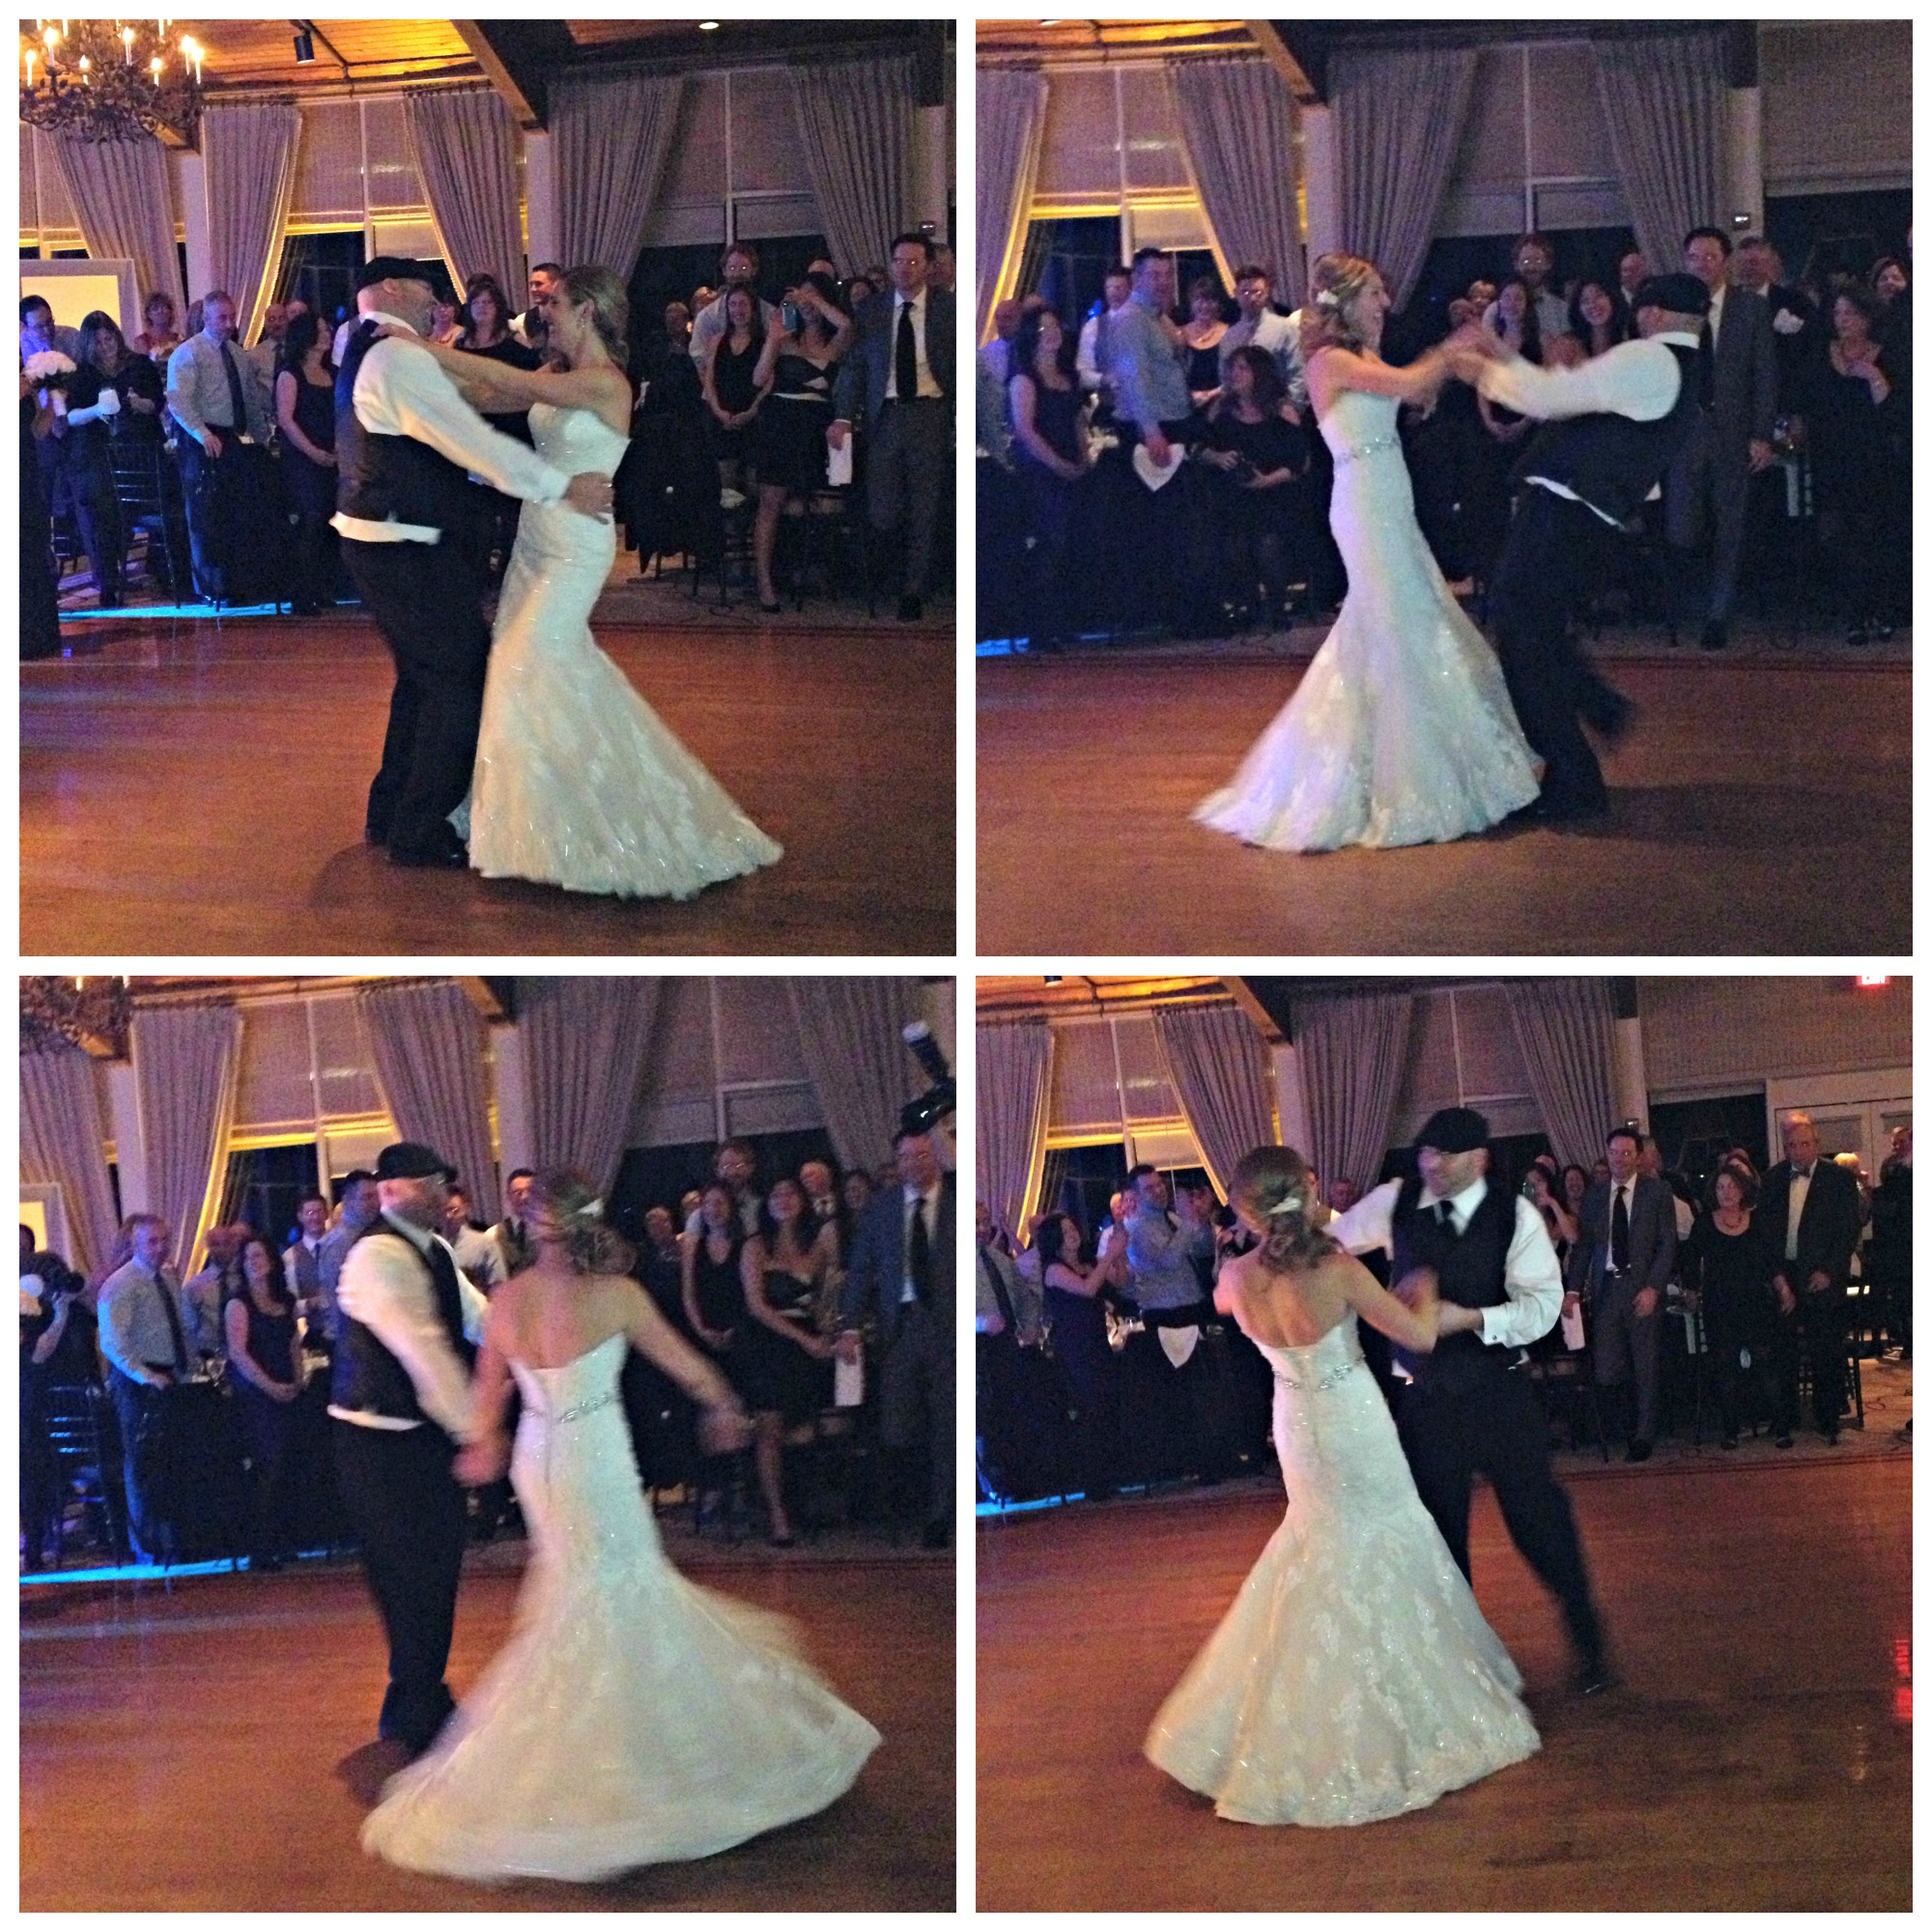 Cate & Joe's Wedding: First Dance